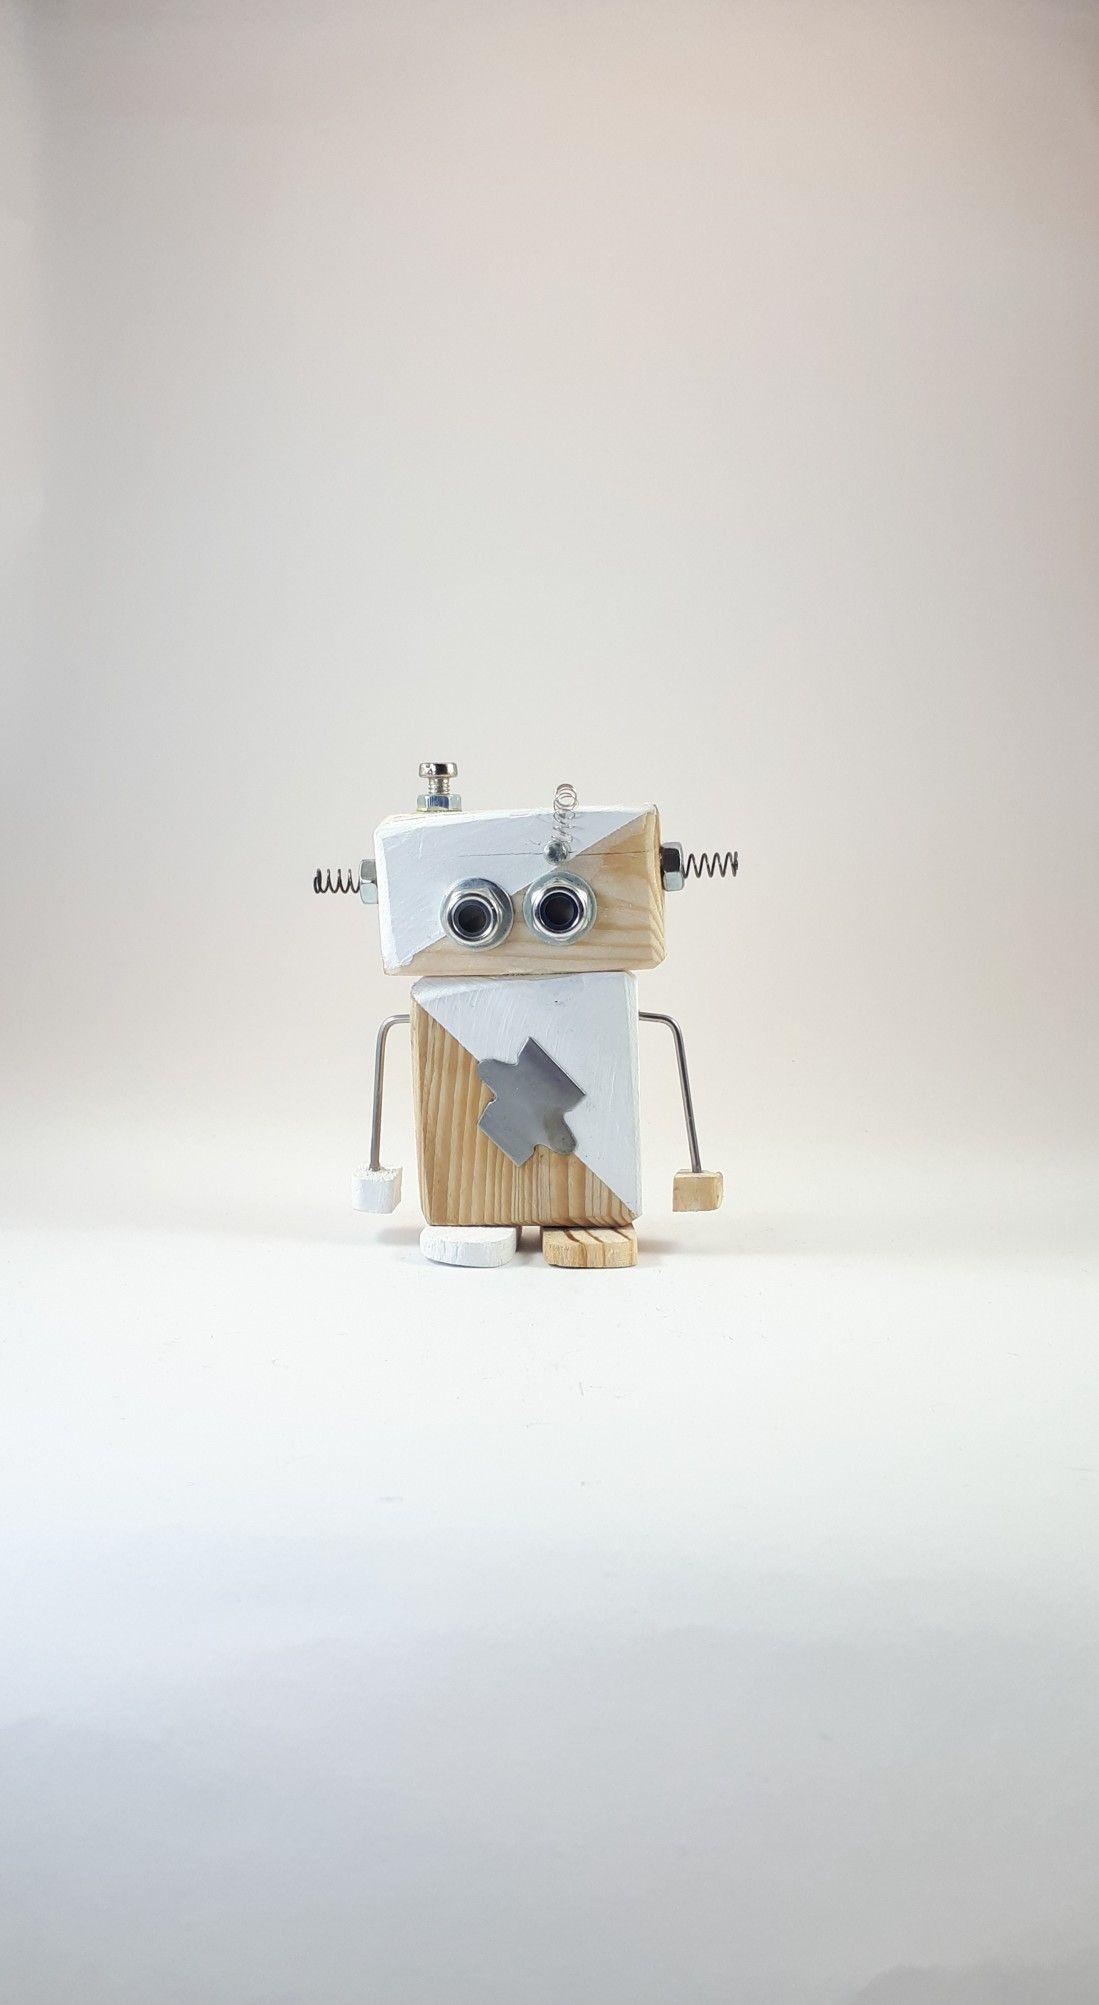 Ahsap Robot Wooden Robot Diy Pallet Projects Kid Robot Toys Pallet Diy